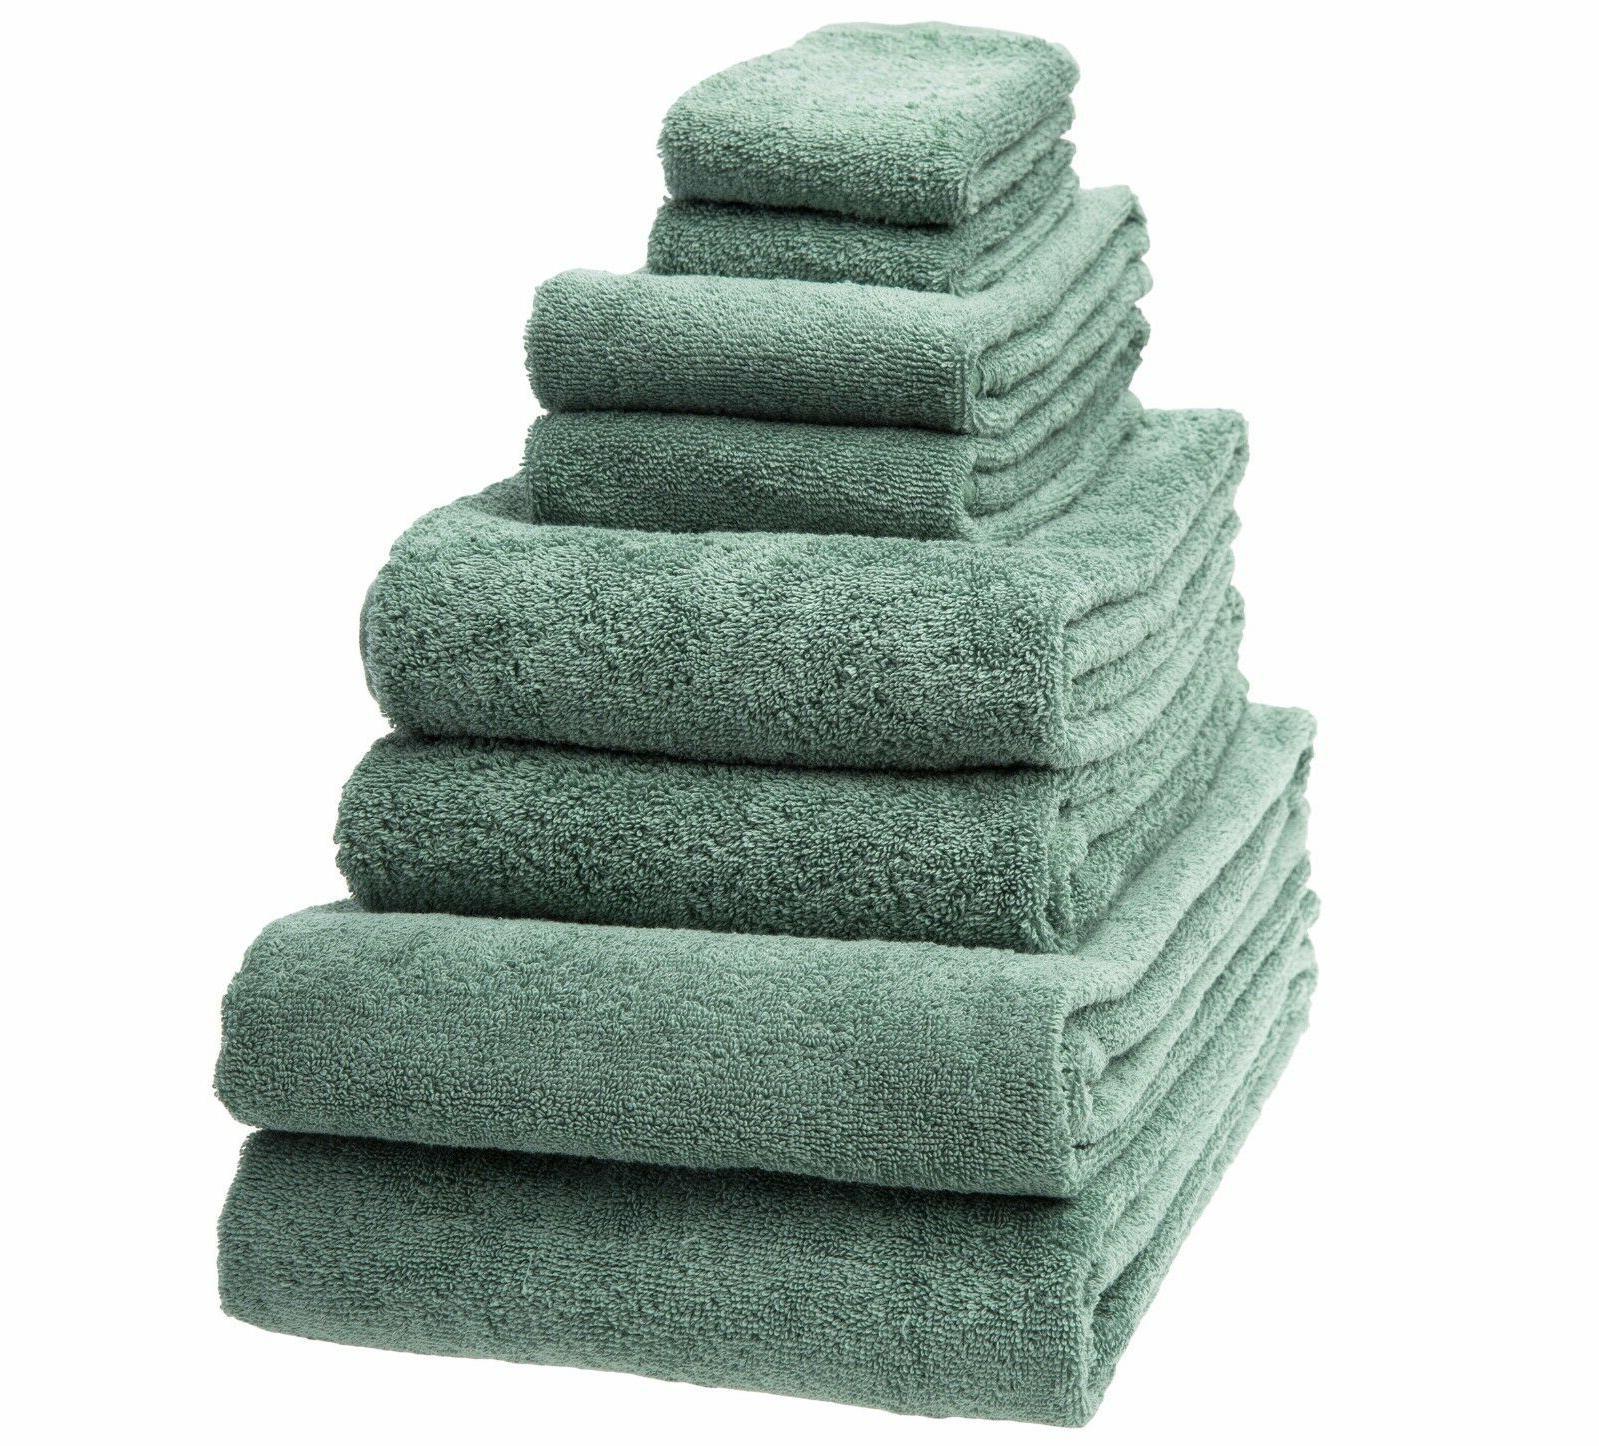 Bath Towel Plush Turkish Cotton Towels Premium